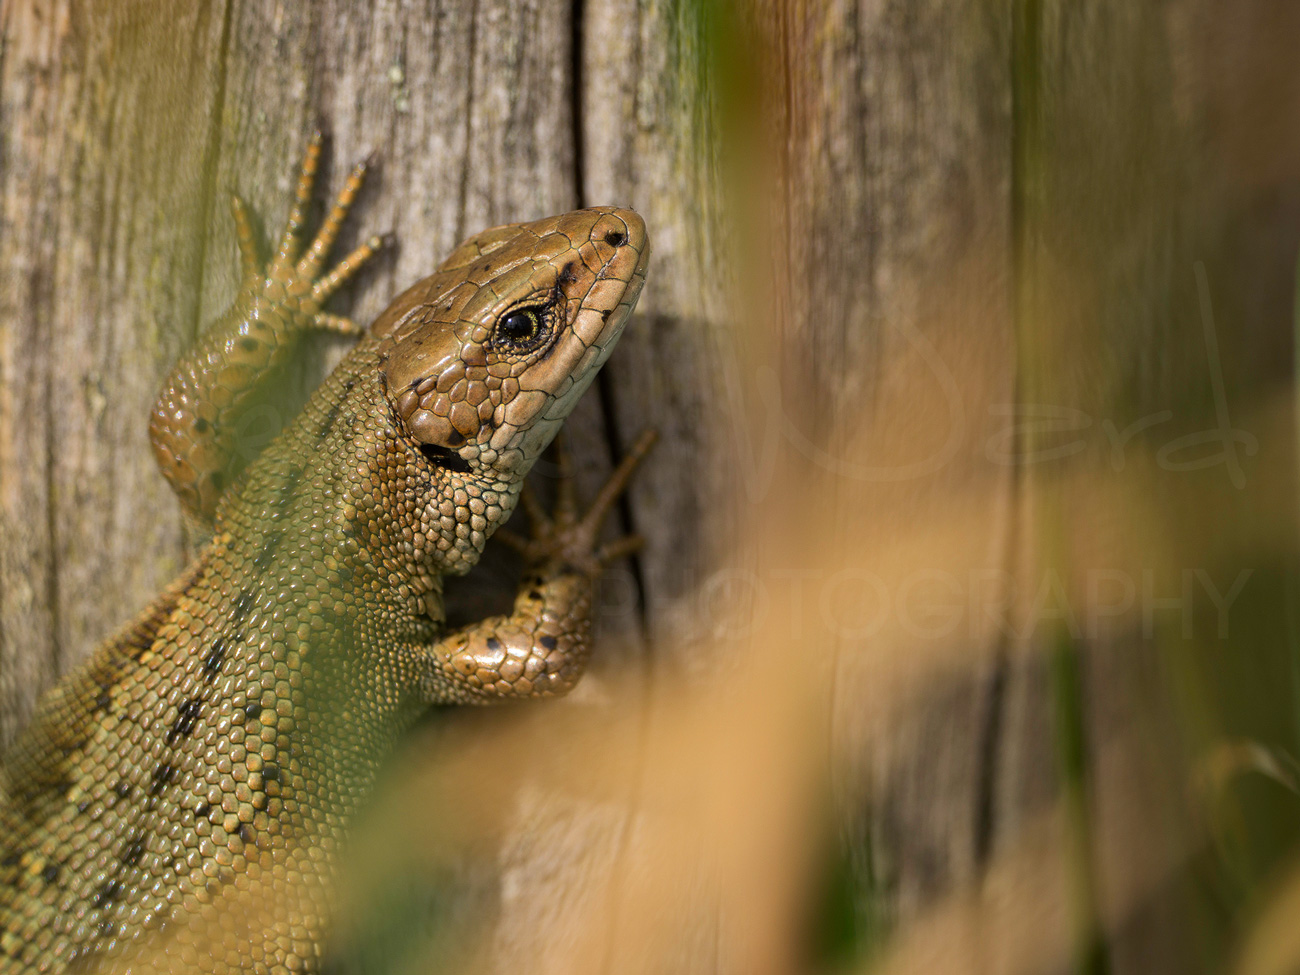 Common Lizard Photography Workshop Peak District